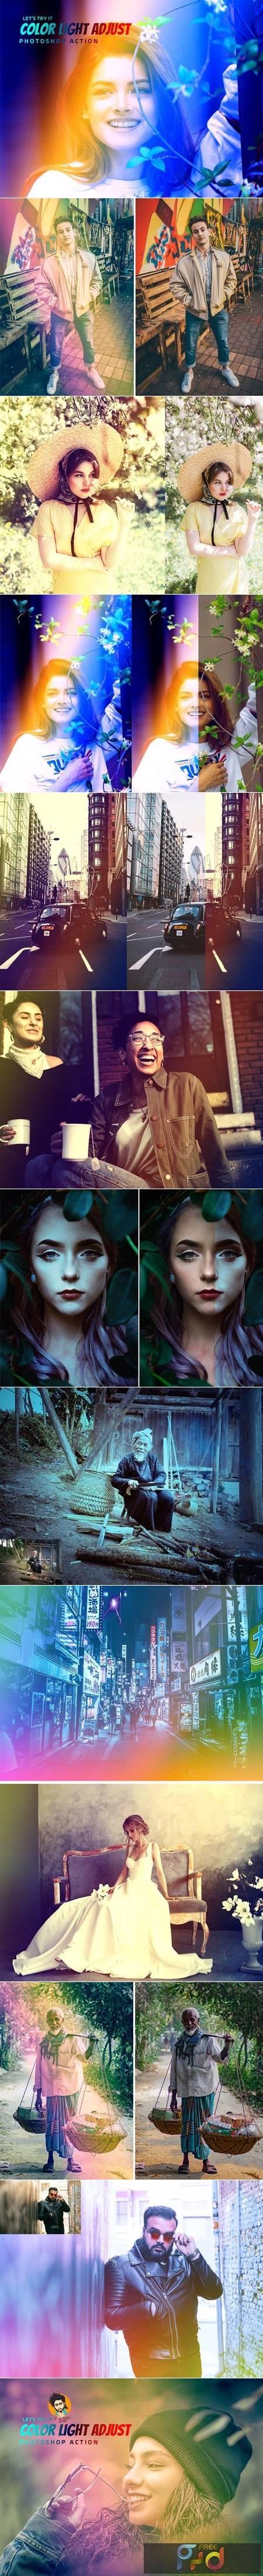 Color Light Adjust Photoshop Action 5806424 1